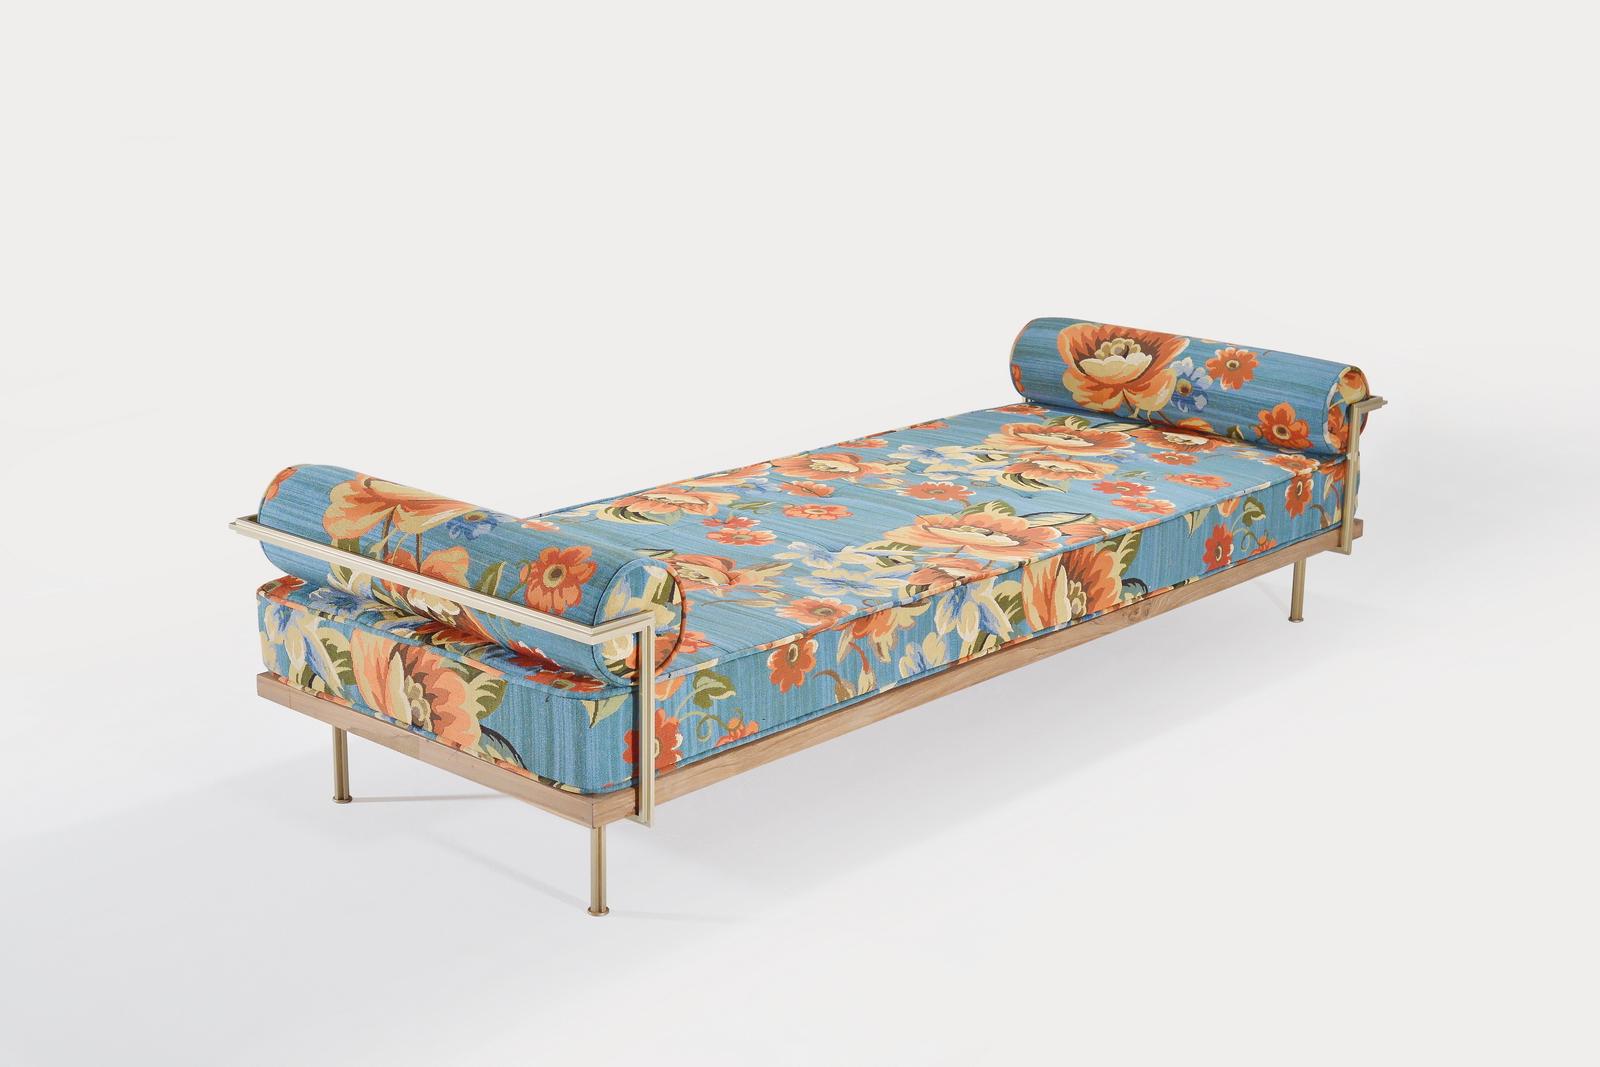 PTendercool-Sofa-PT76-BS1-TE-NO-JD&CO (Garden Tapestry)-190903-02